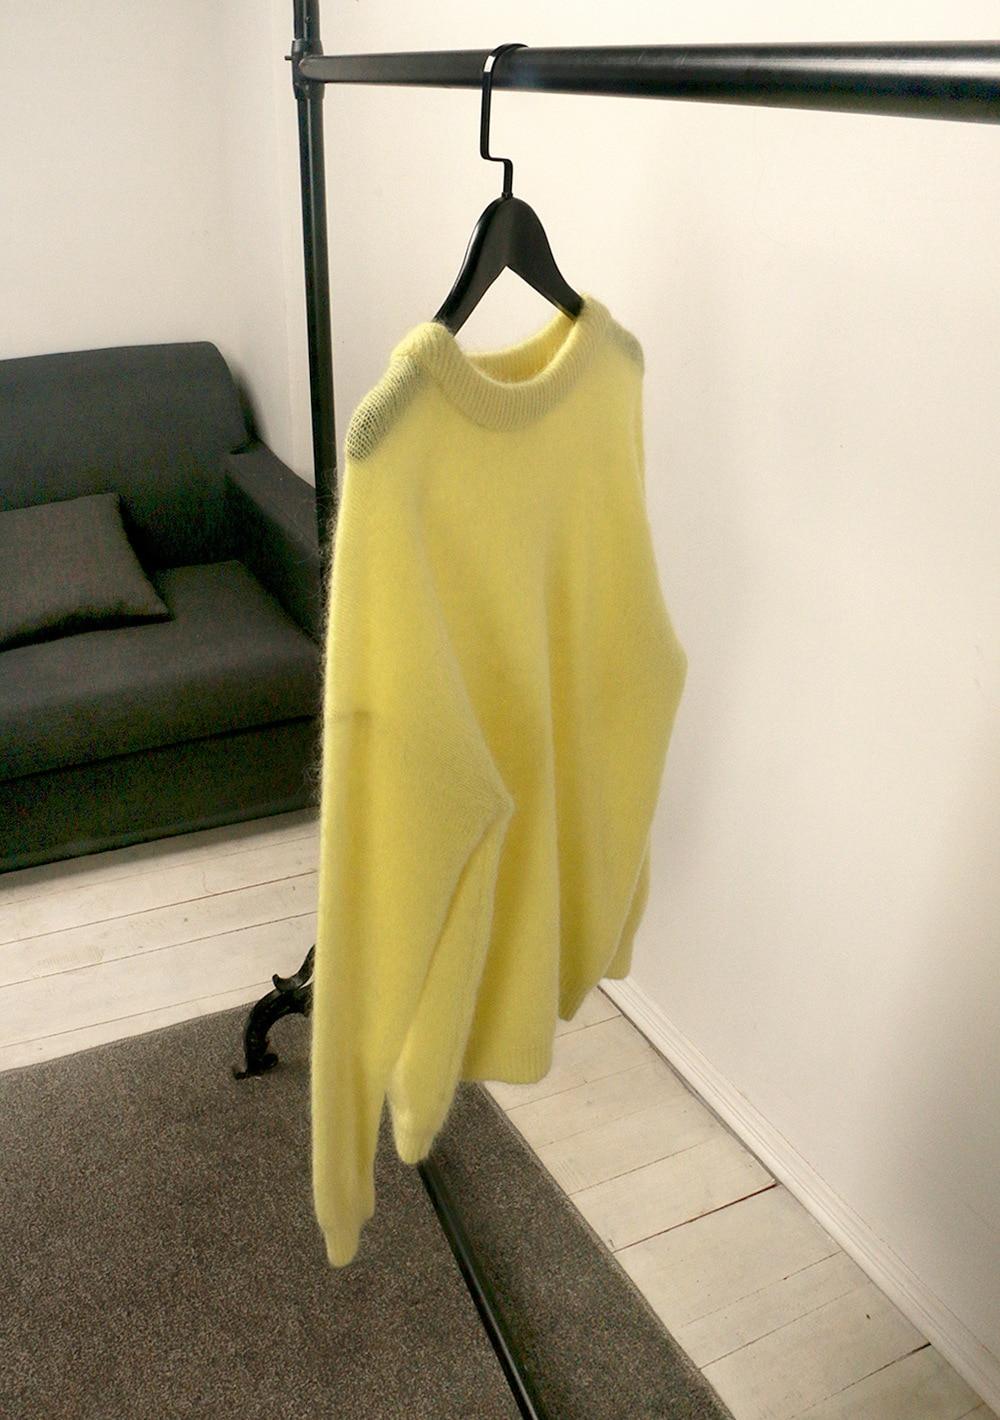 SHUCHAN Yellow SWEATER WOMEN 34% Mohair Free Shipping Items Clothes for Women Streetwear Women Clothes Korean Fashion enlarge